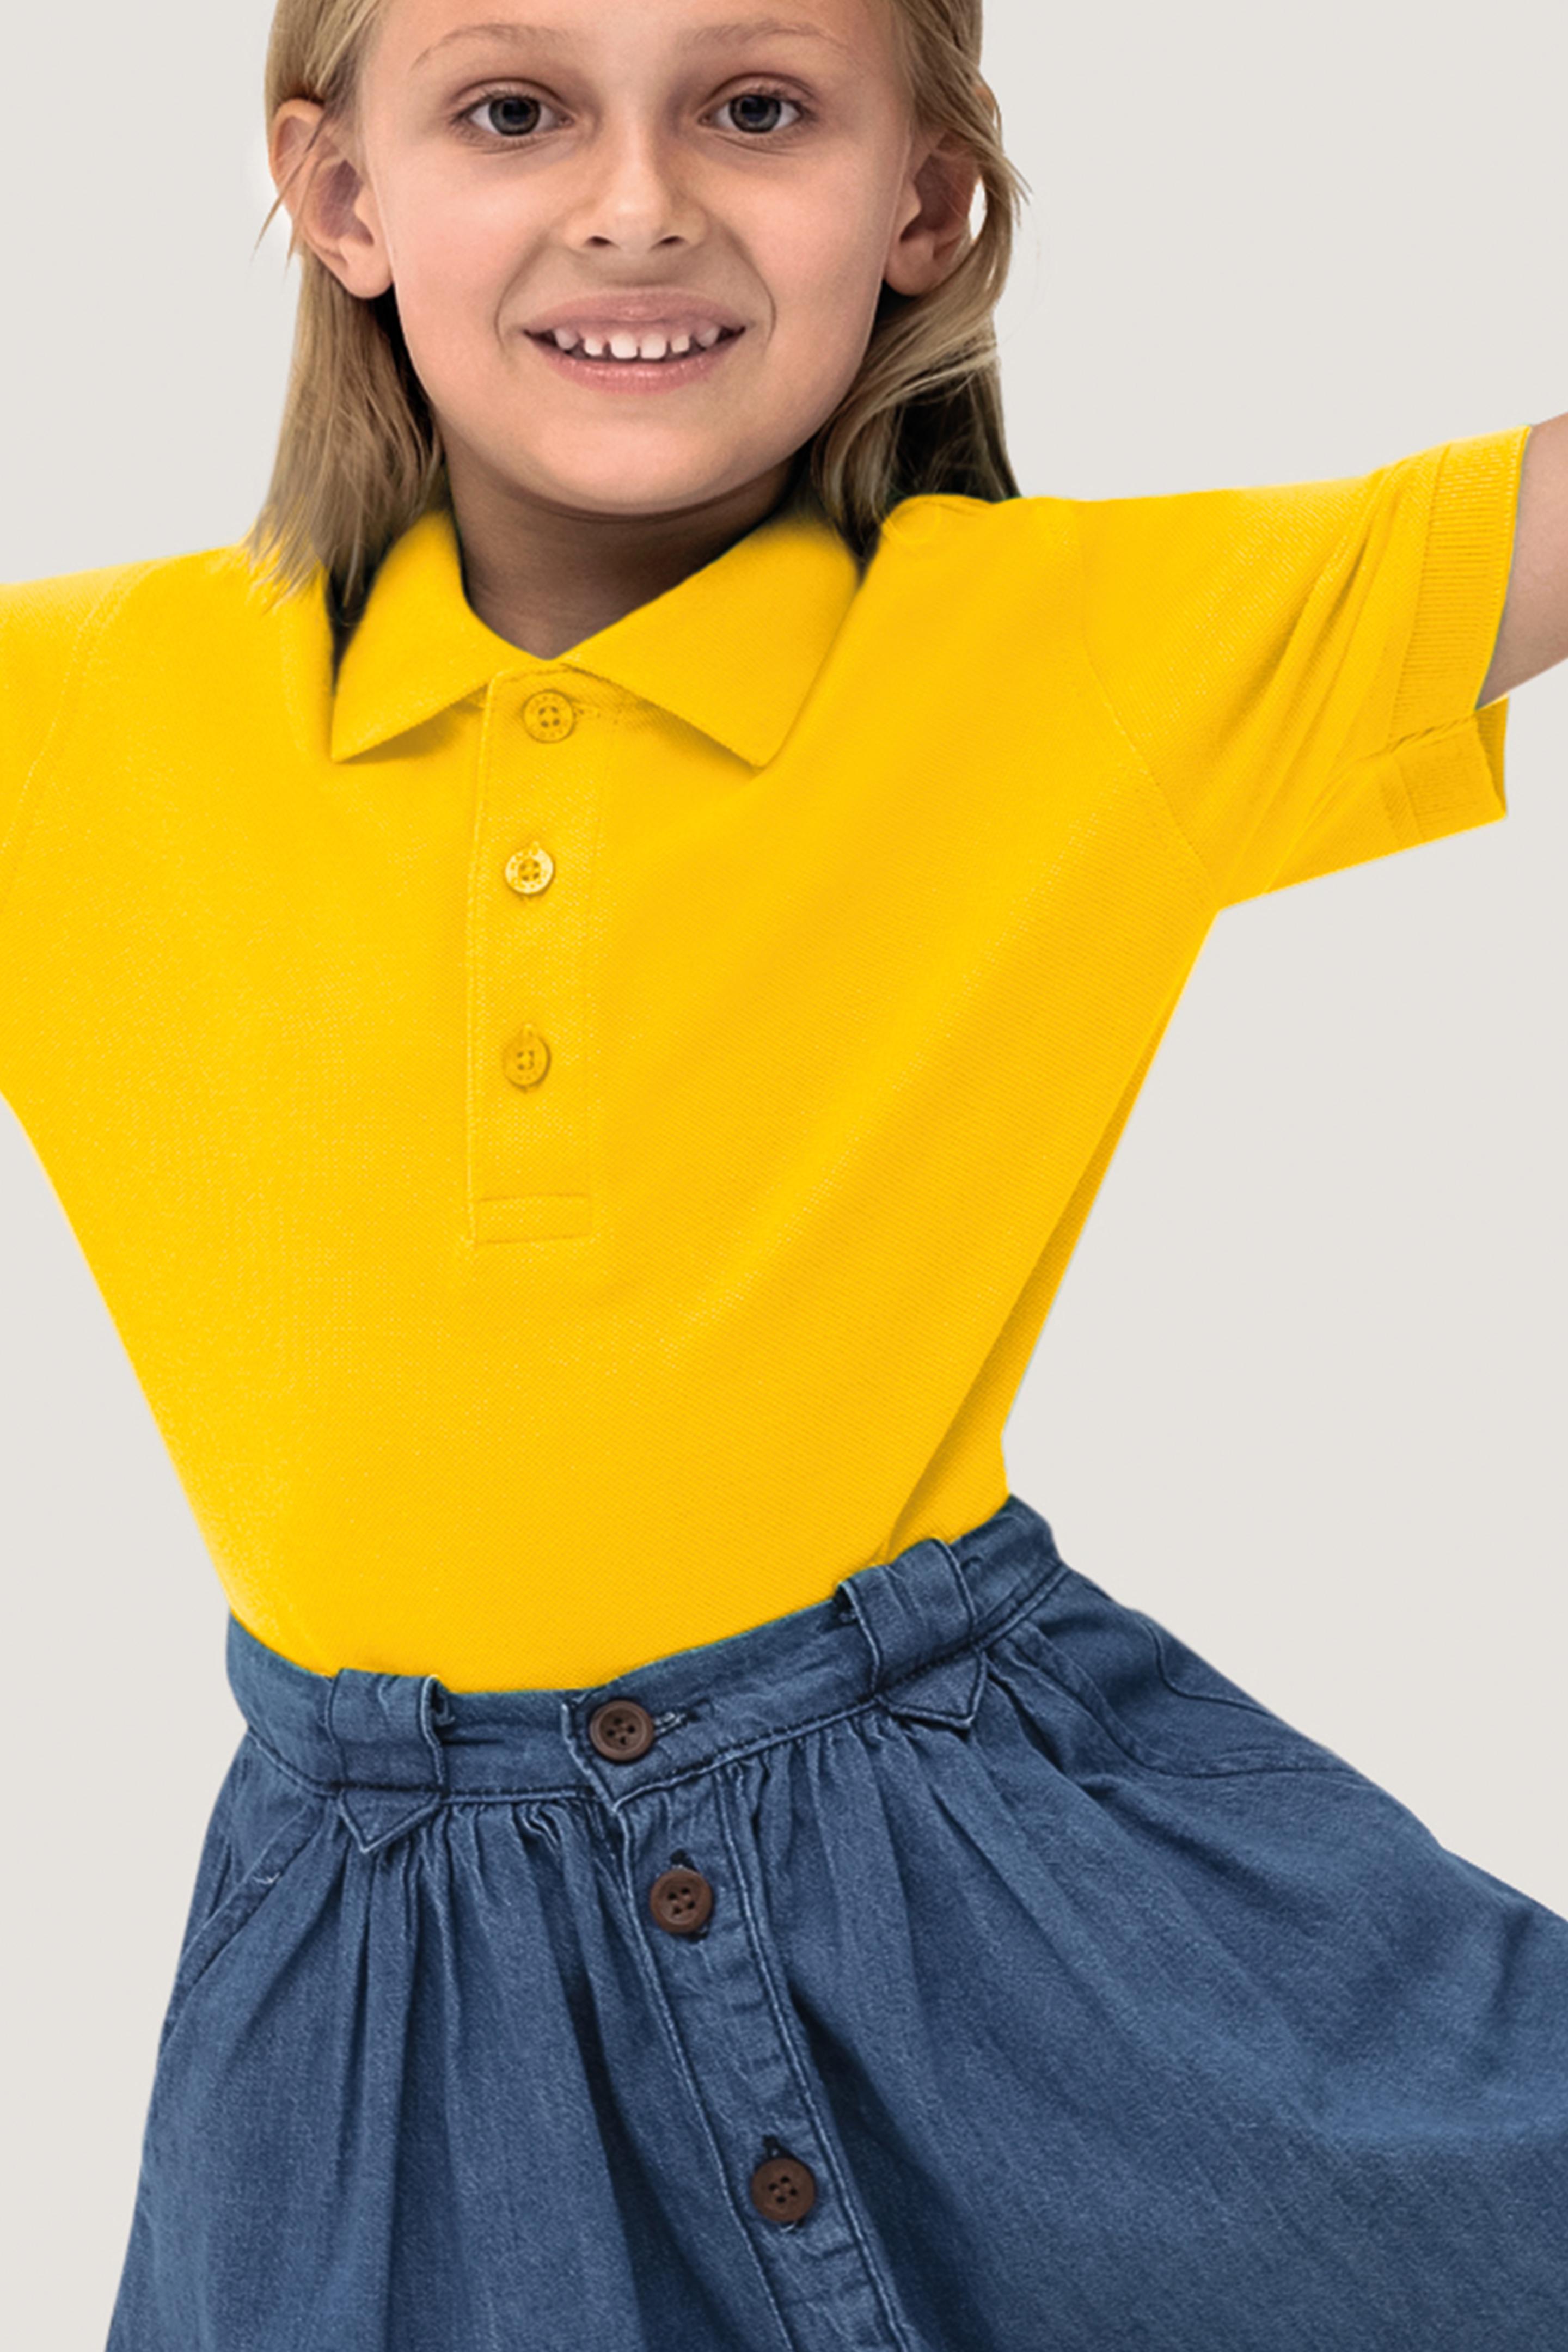 HAKRO Kinder Poloshirt Classic NO. 400